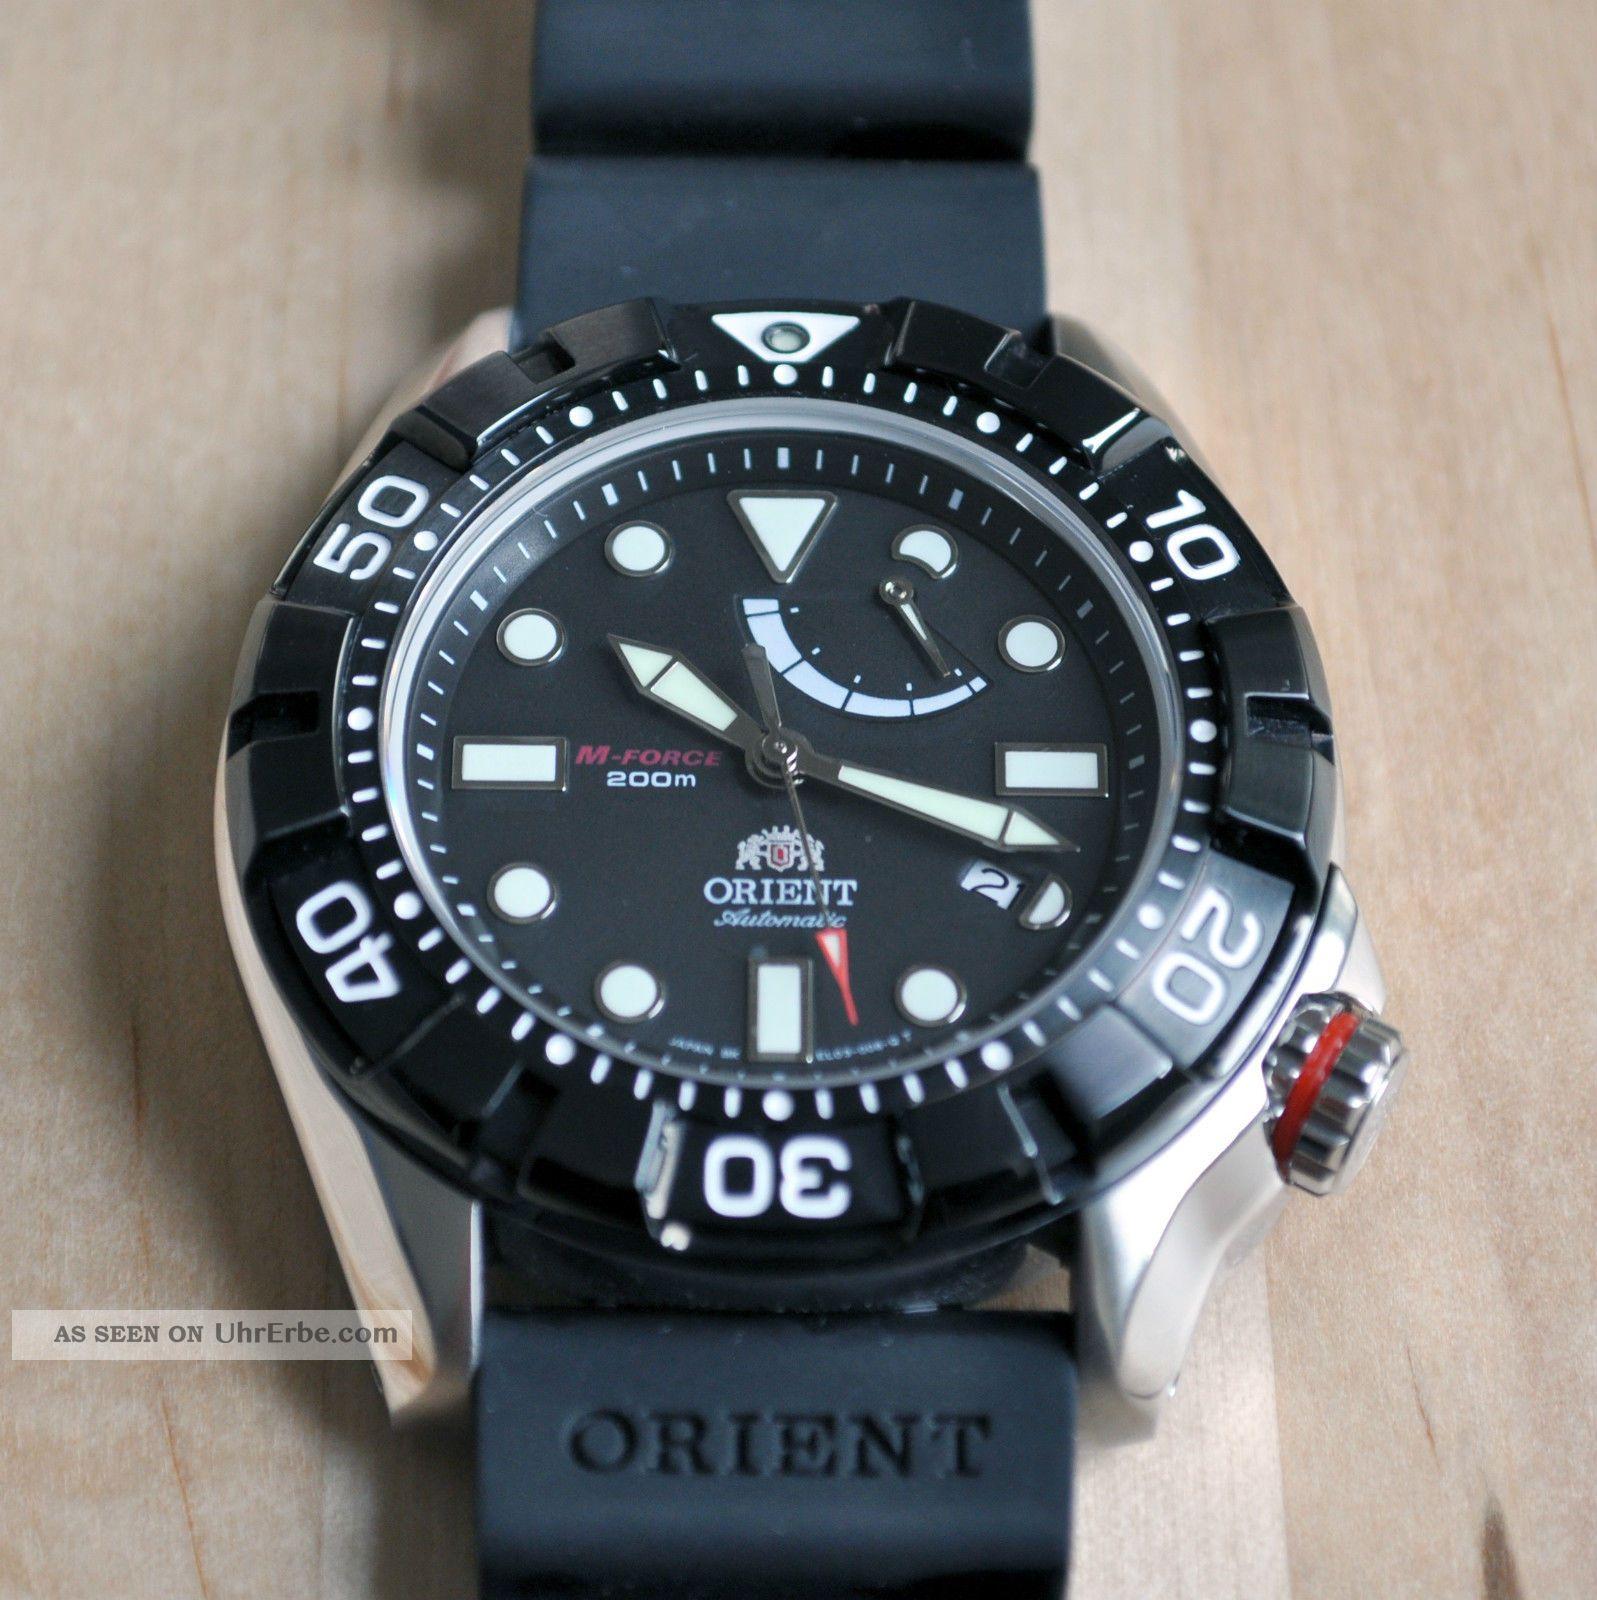 Orient M Force Saphir Diver El03004b Seiko 200m Kautschuk Uhr Air Automatik Armbanduhren Bild